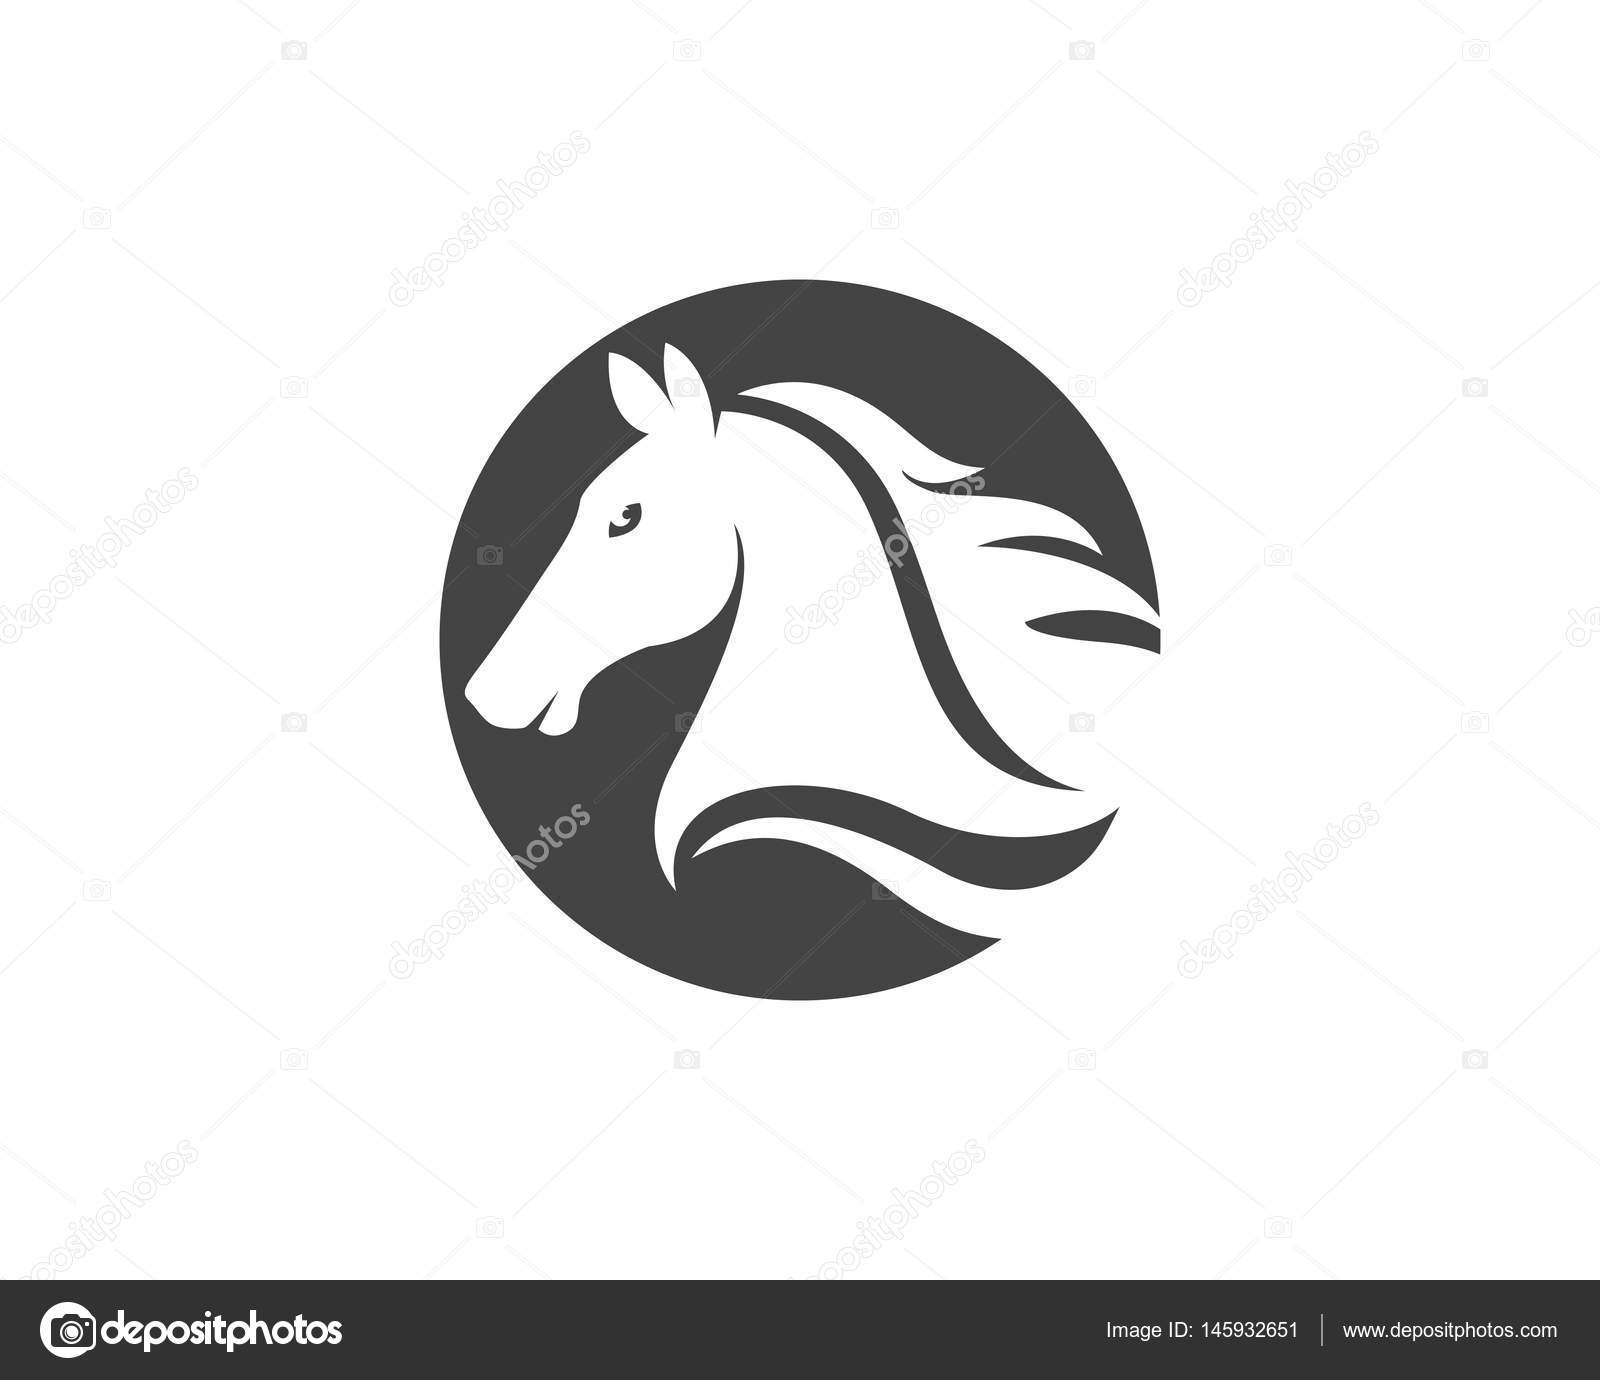 Kopf Pferd Logo und Vorlage Symbole — Stockvektor © elaelo #145932651